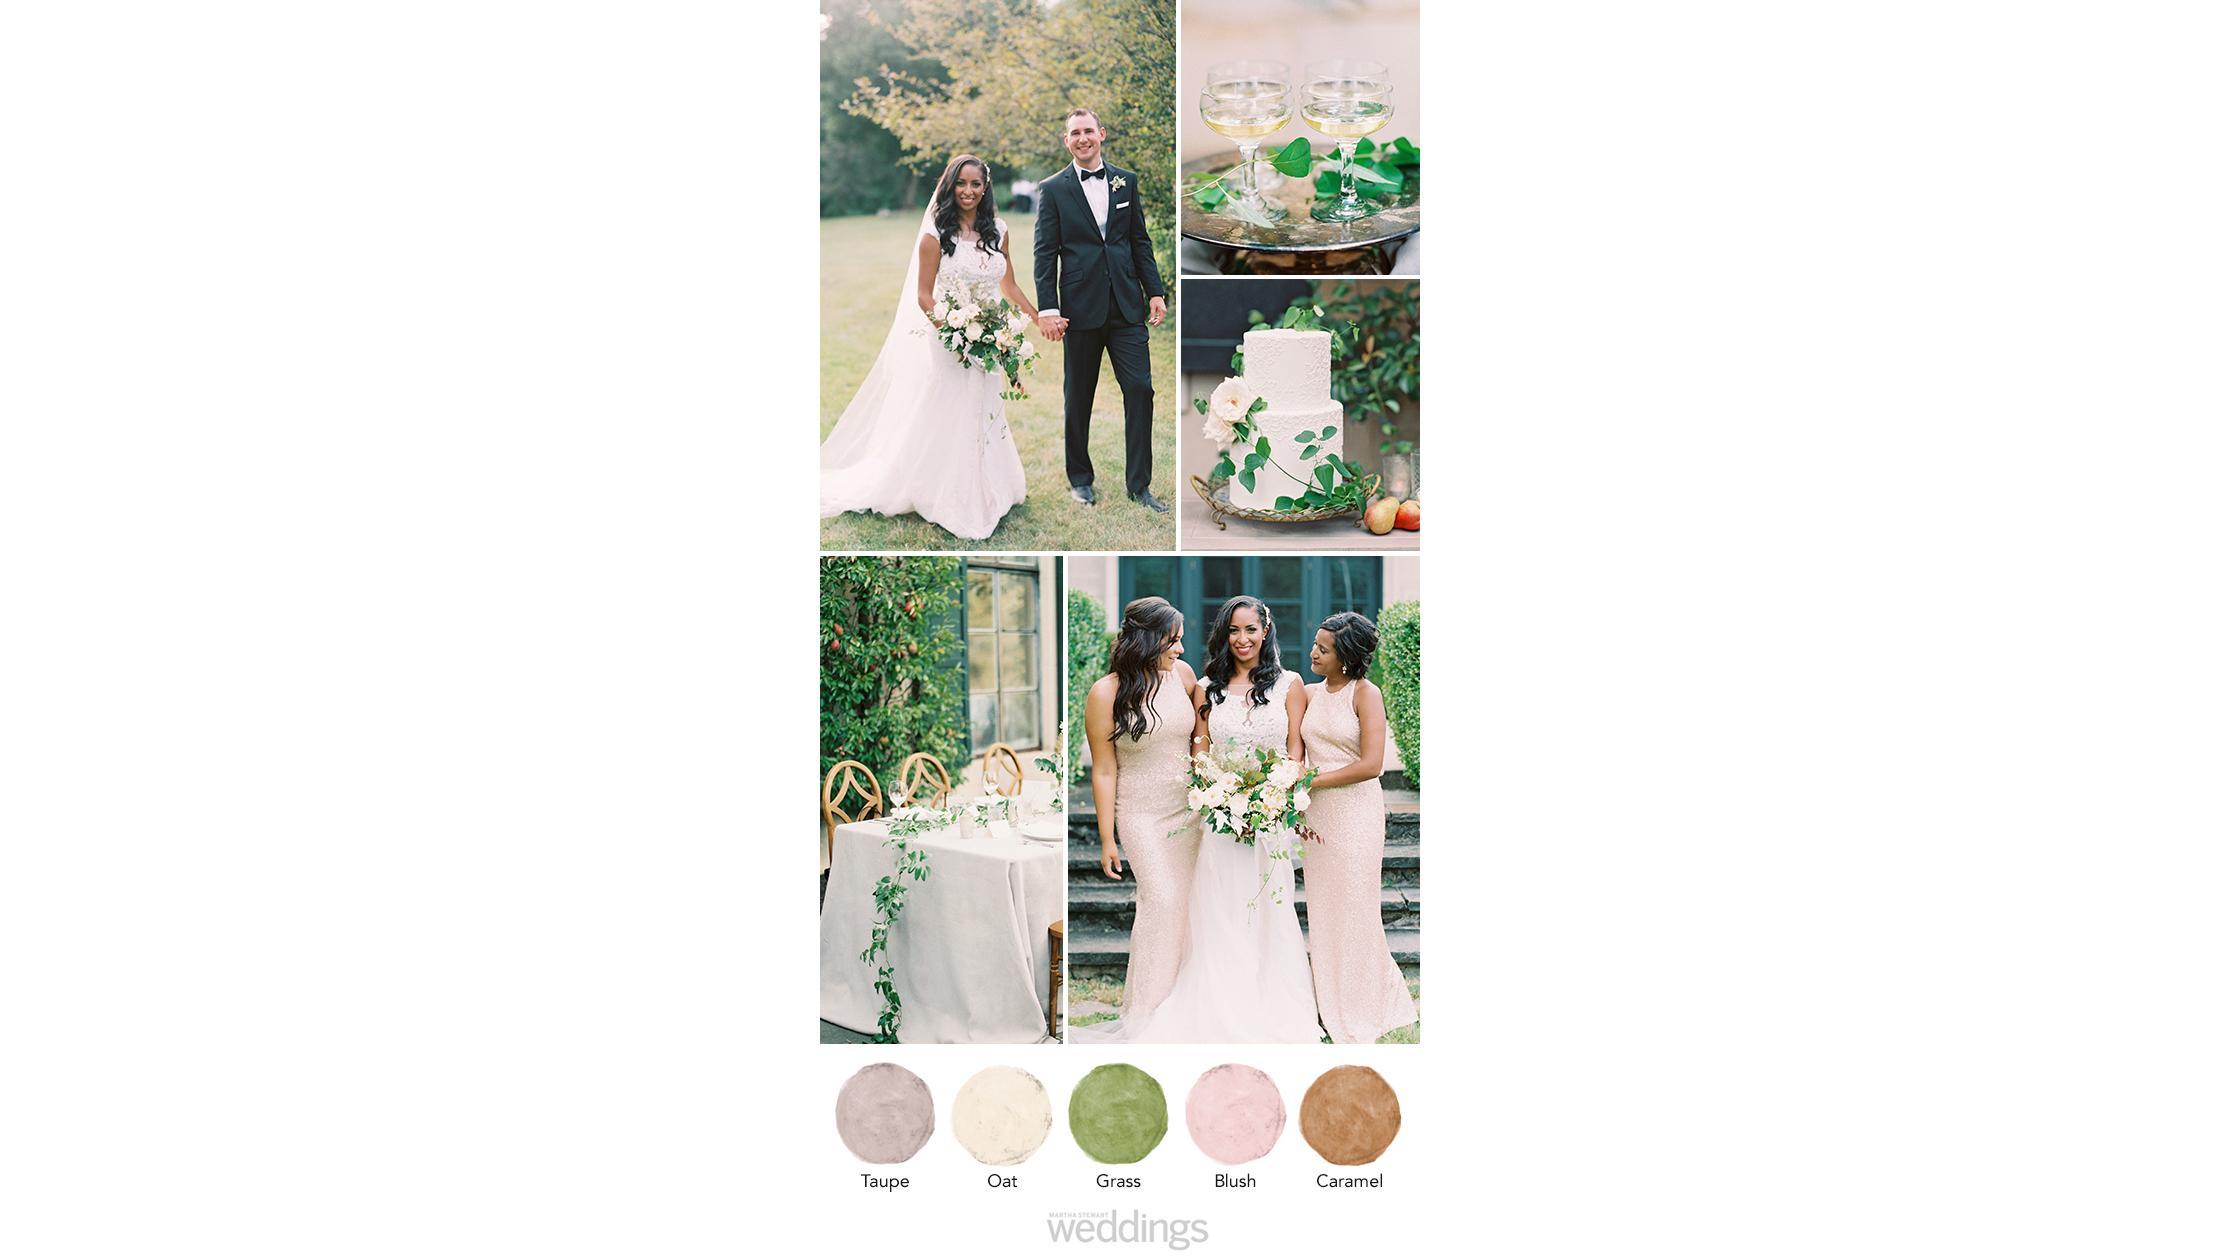 stone ivy wedding color palette ideas